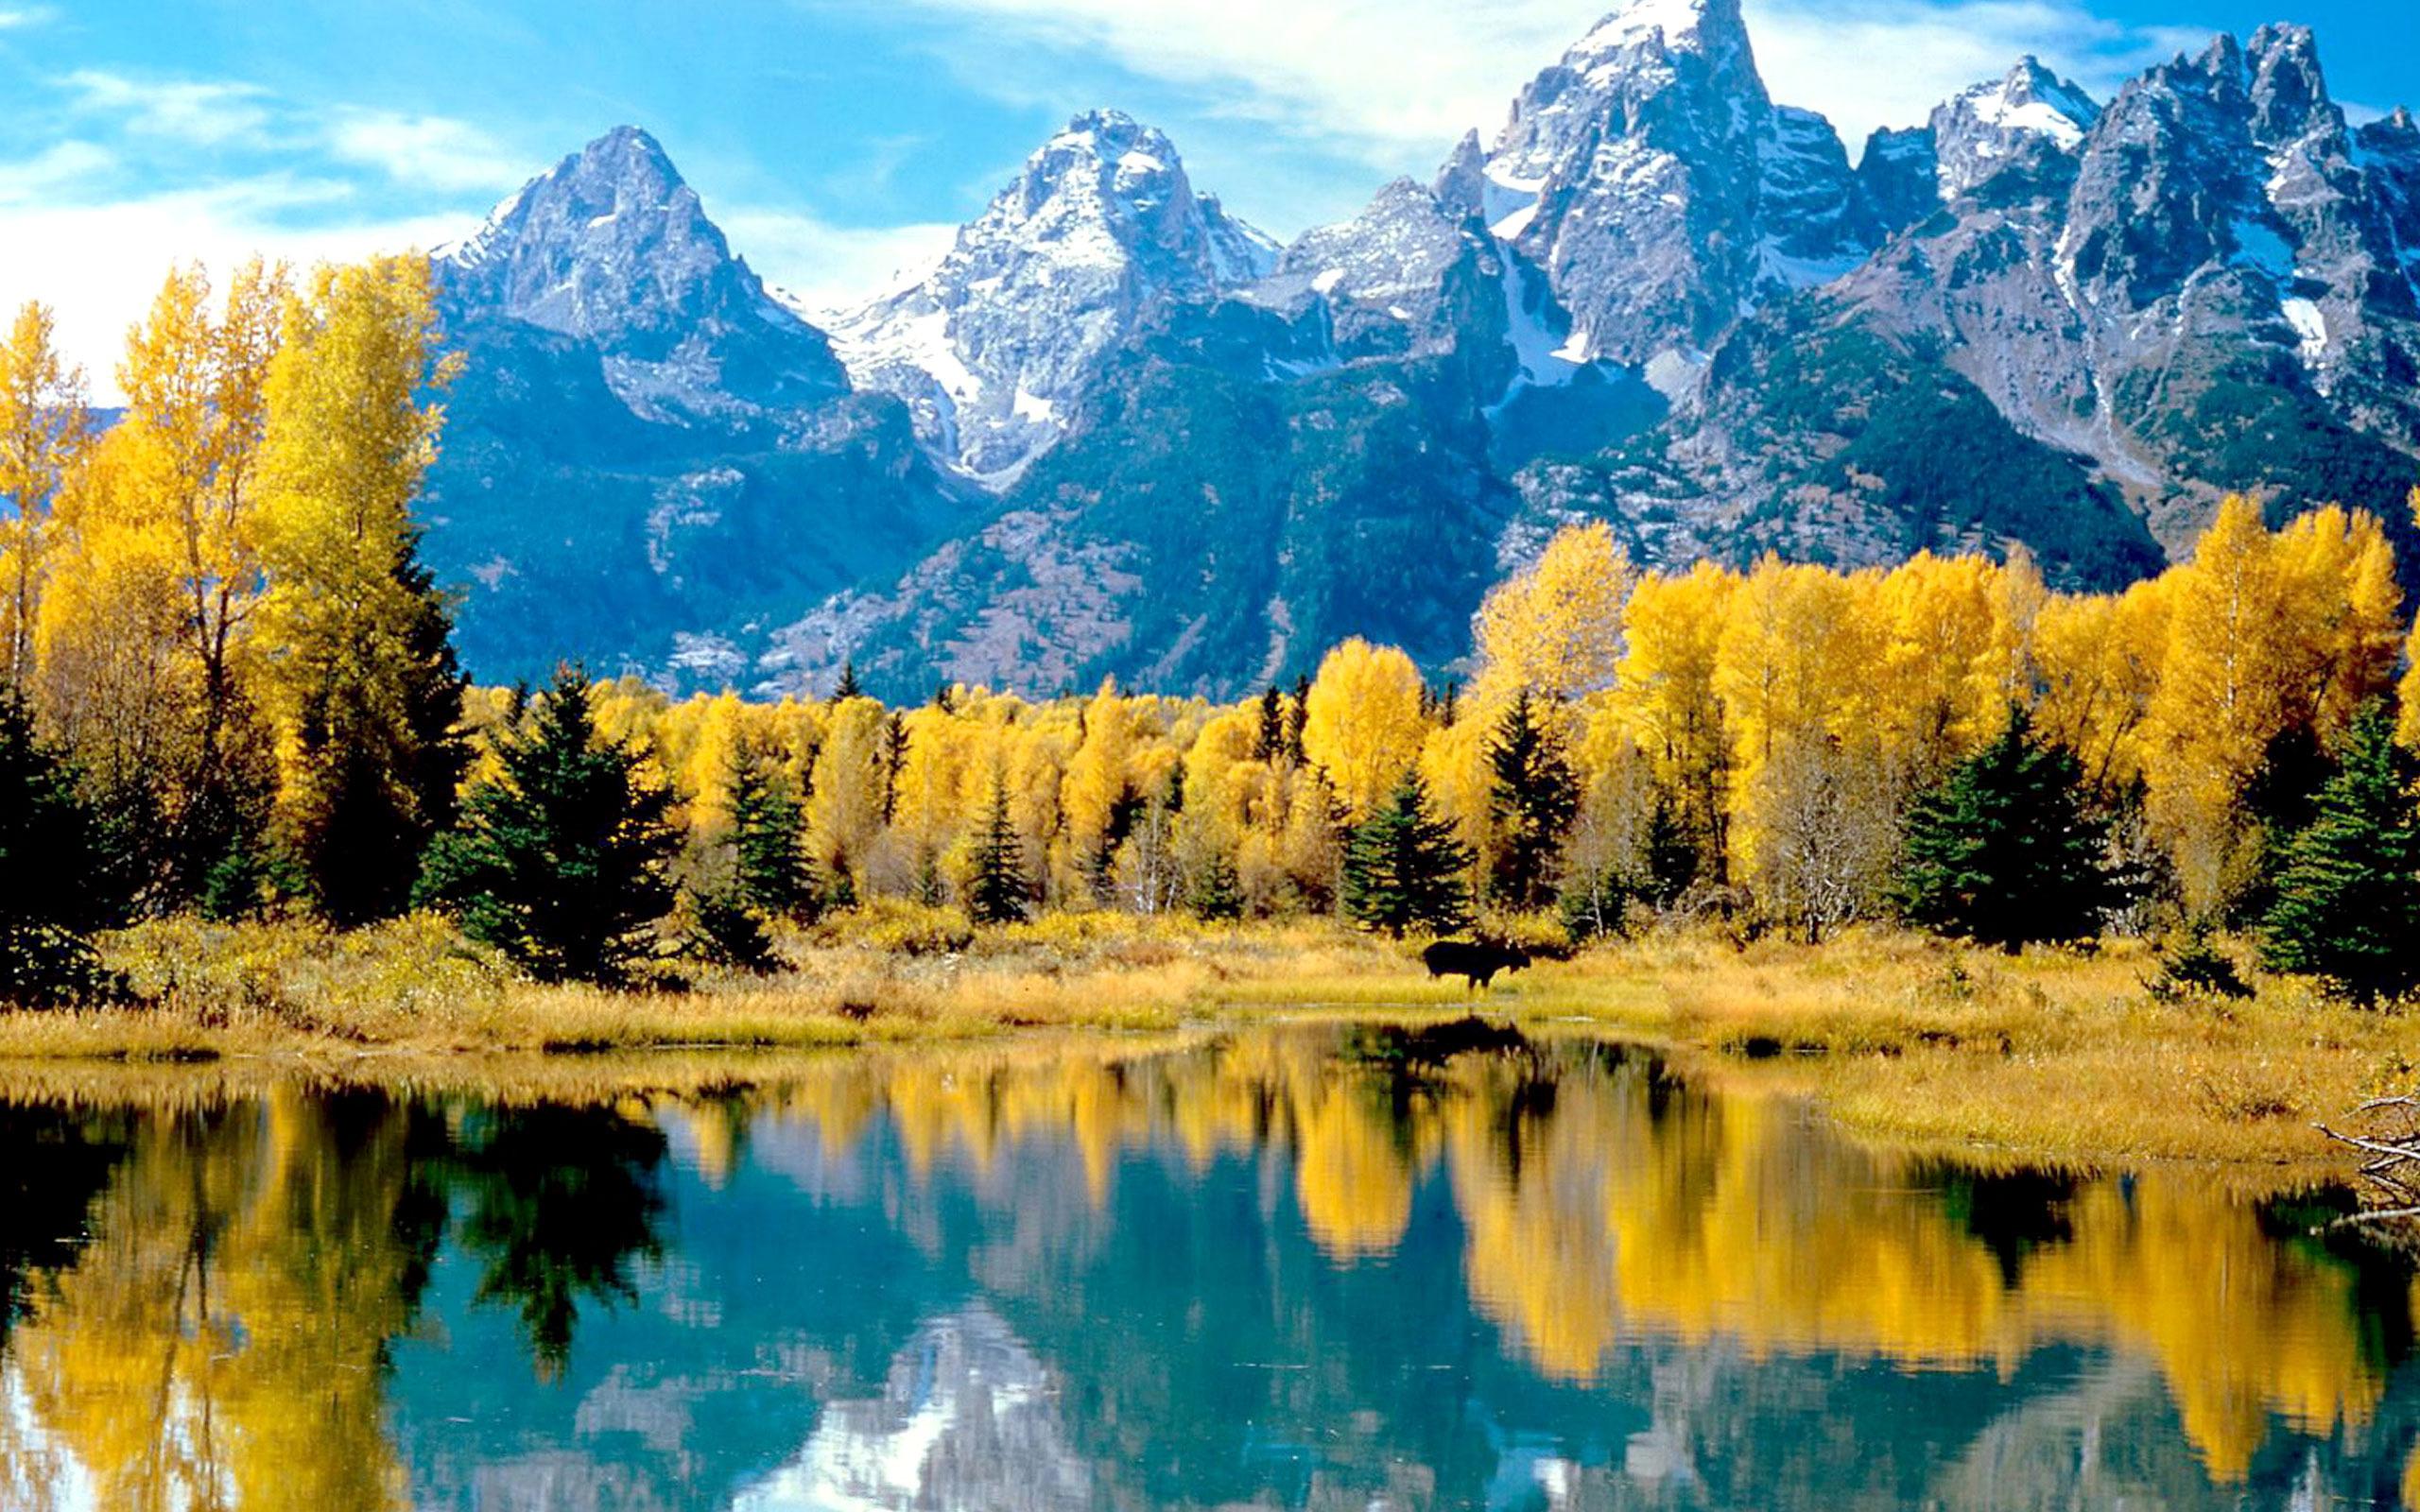 2560x1600px 1141.89 KB Grand Teton National Park #386950.